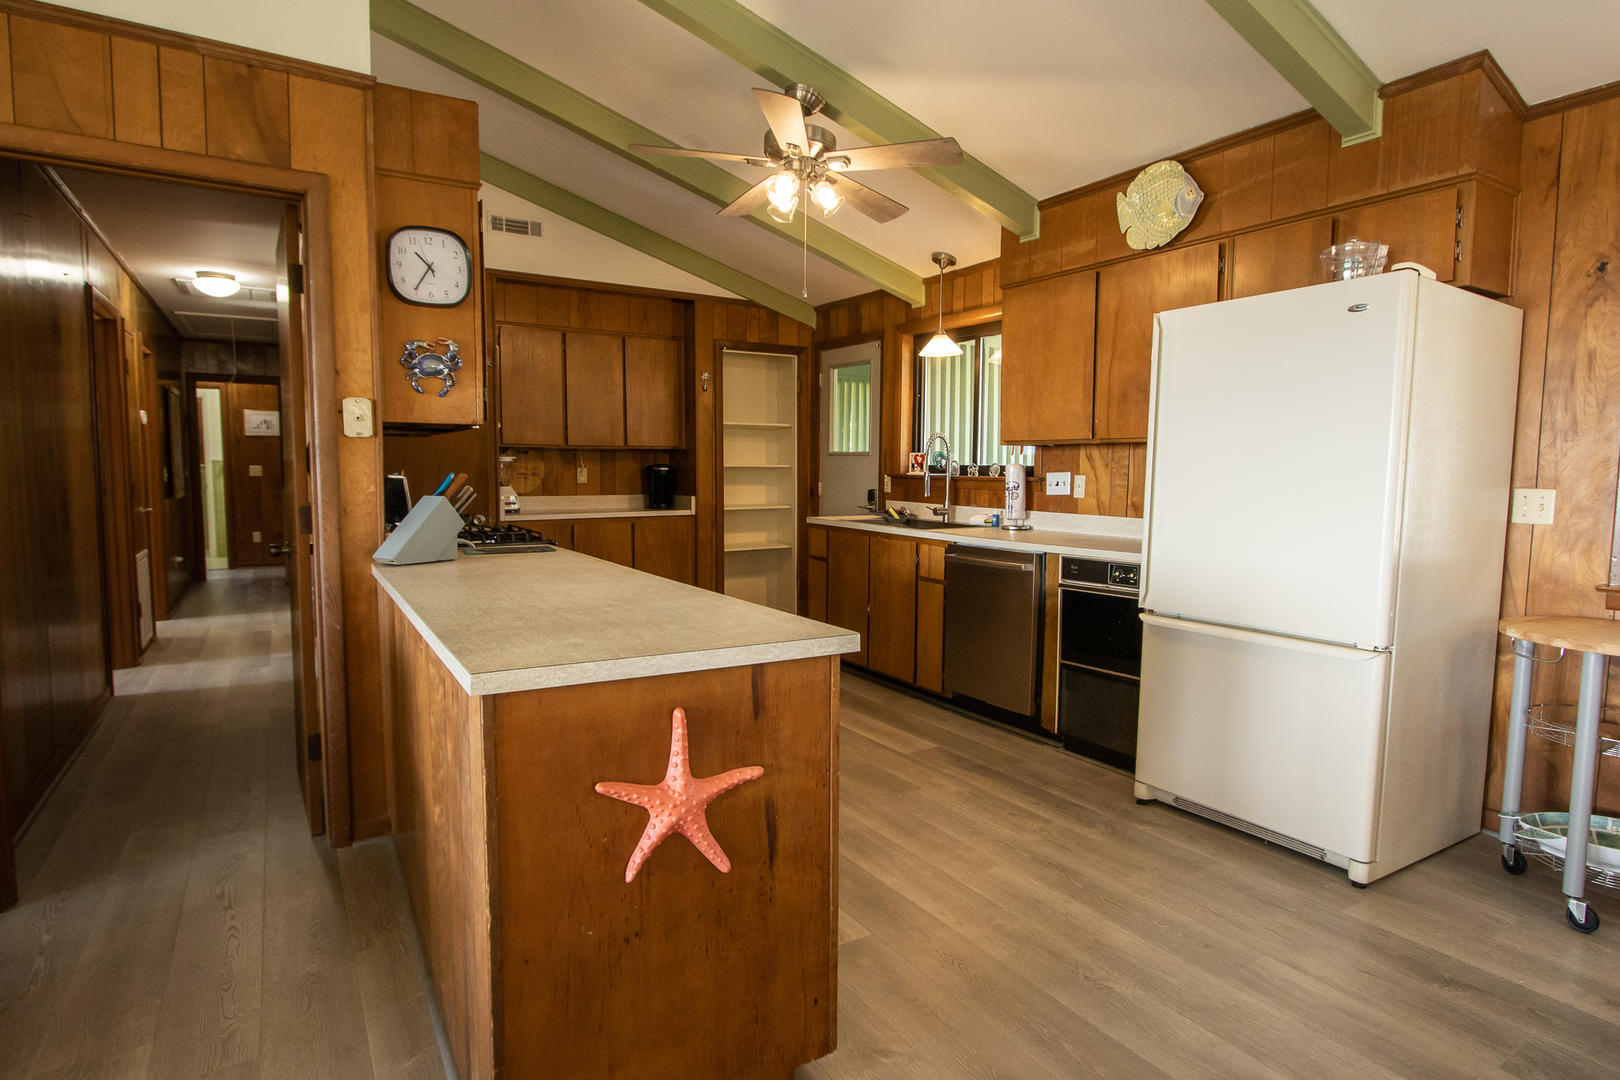 Kitchen, keurig